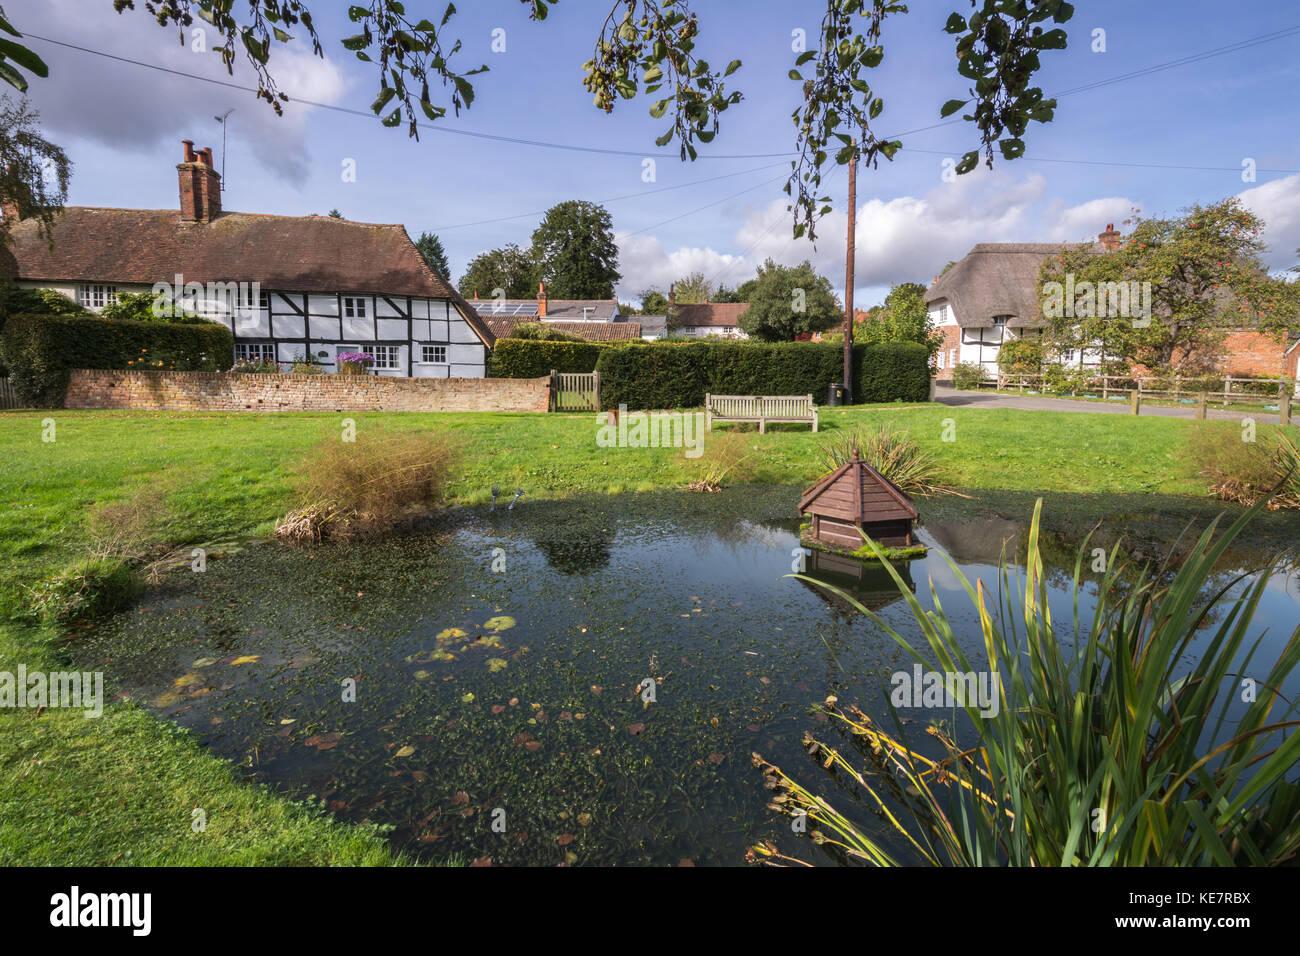 upton-grey-a-charming-village-in-hampshire-uk-village-pond-and-timber-KE7RBX.jpg